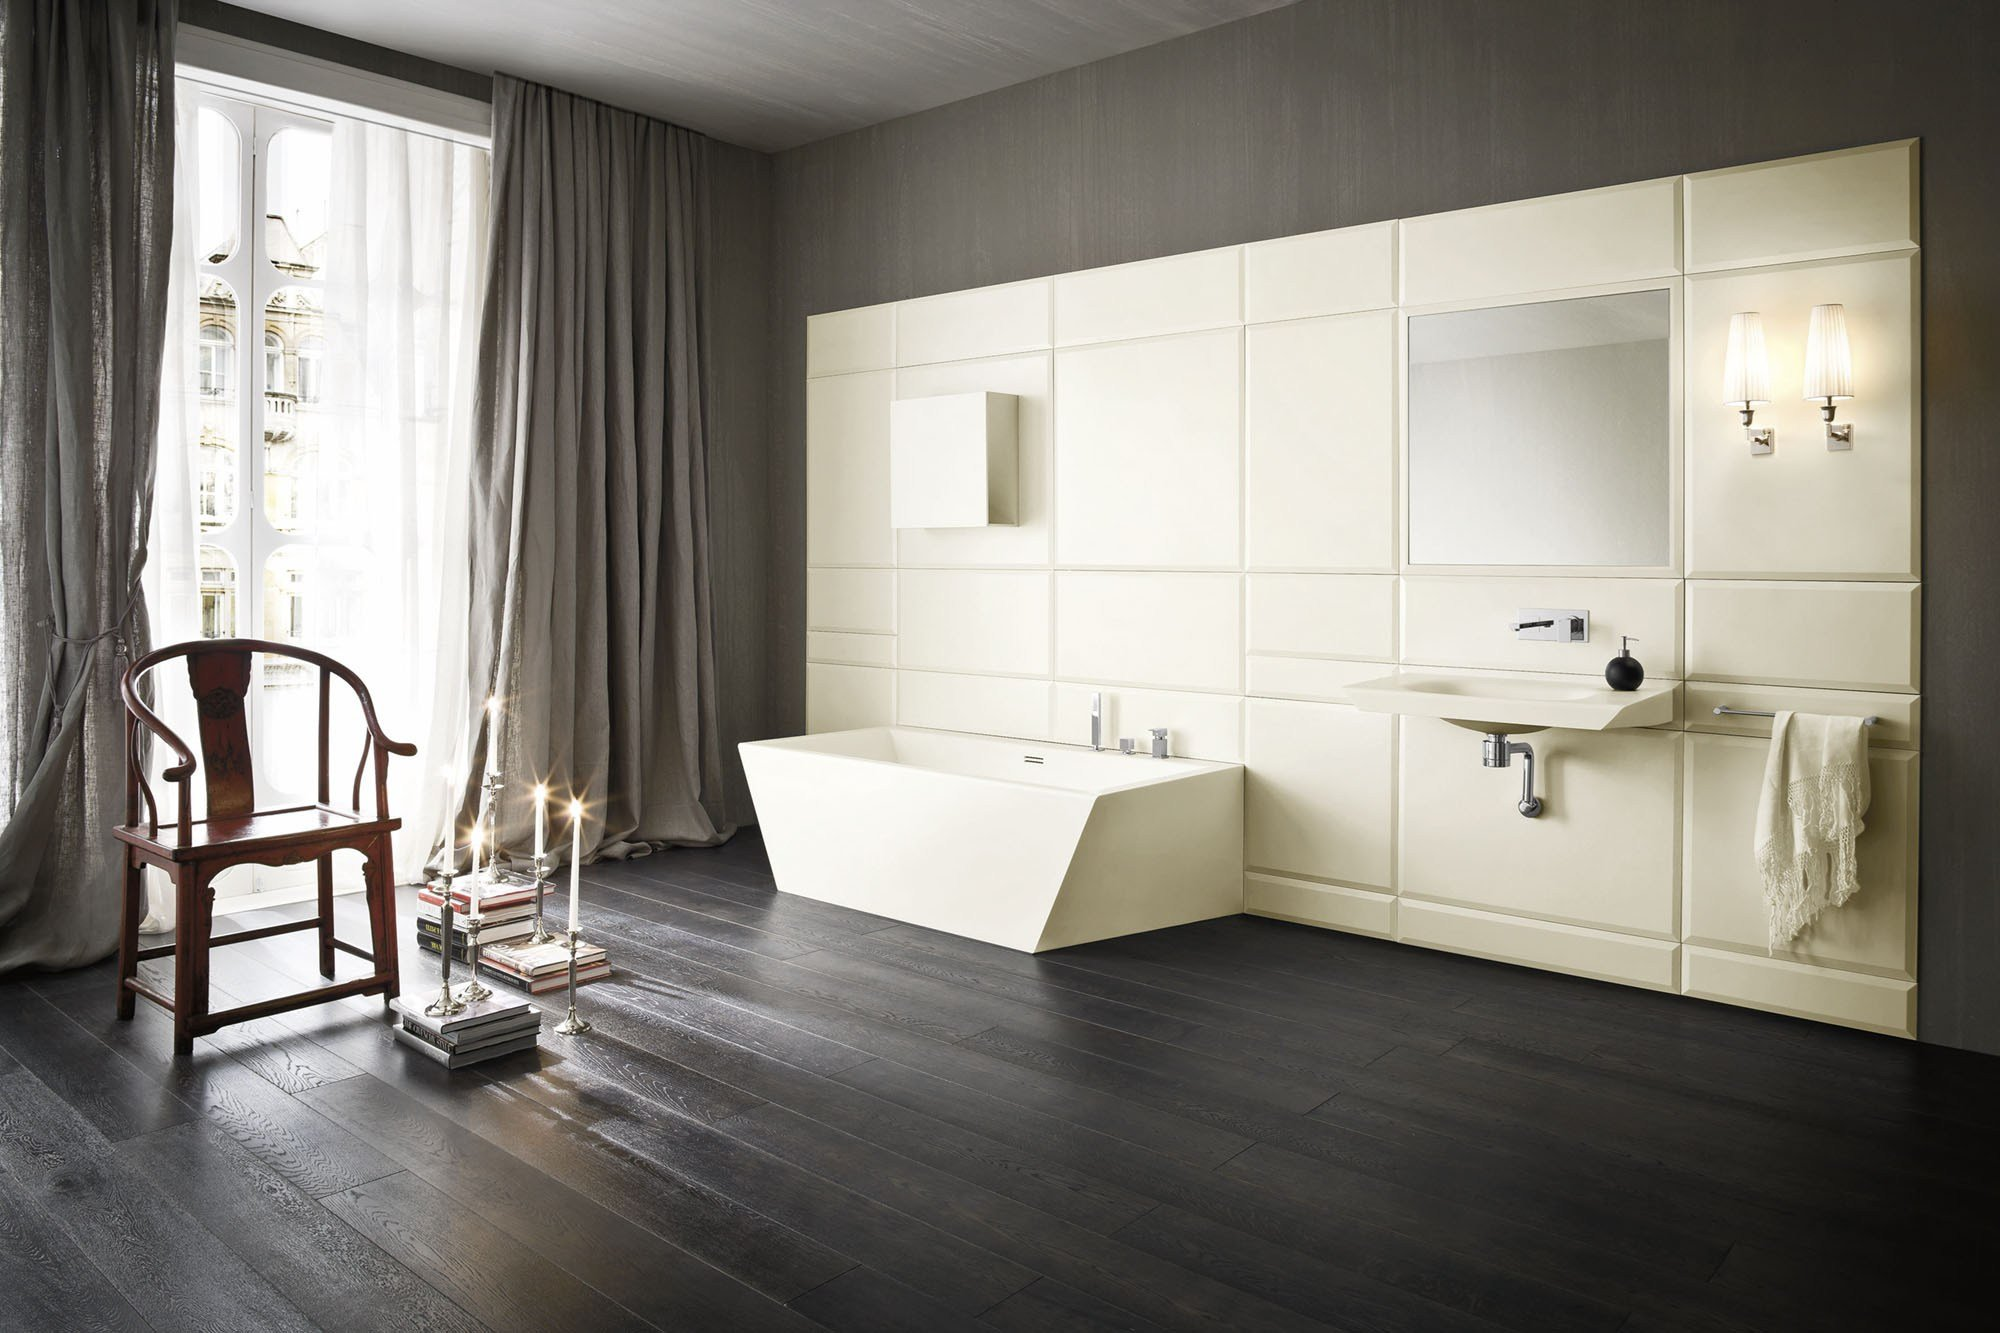 Warp badezimmer ausstattung by rexa design design carlo dal bianco - Badezimmer corian ...